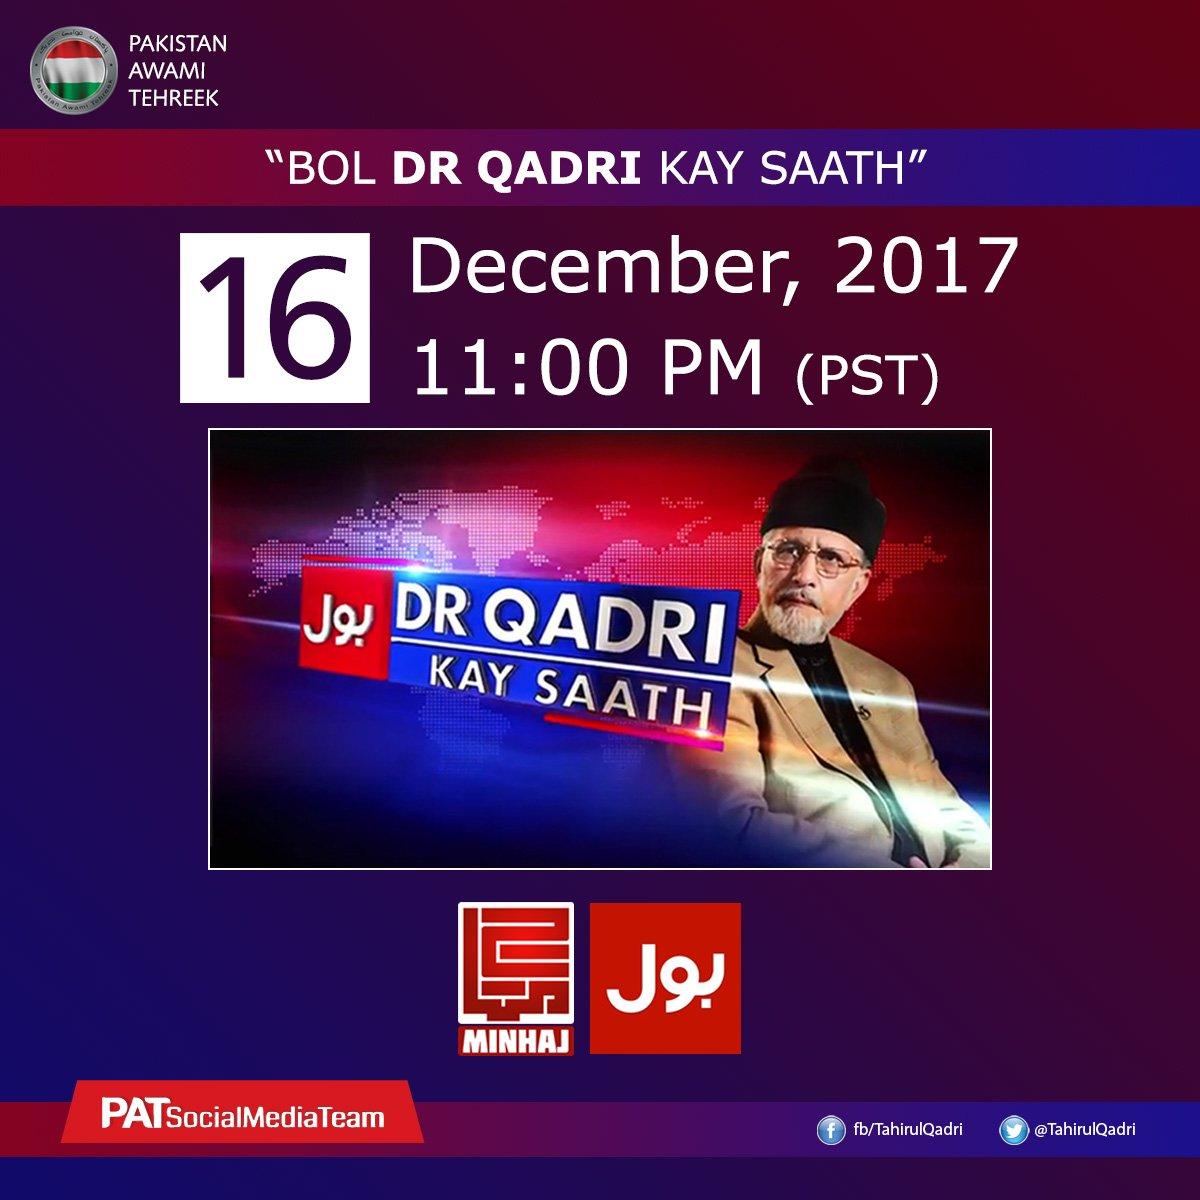 Watch Dr Tahir-ul-Qadri in program 'BOL Dr Qadri Kay Saath' | Saturday, 16th December 2017 at 11:00 PM (PST)